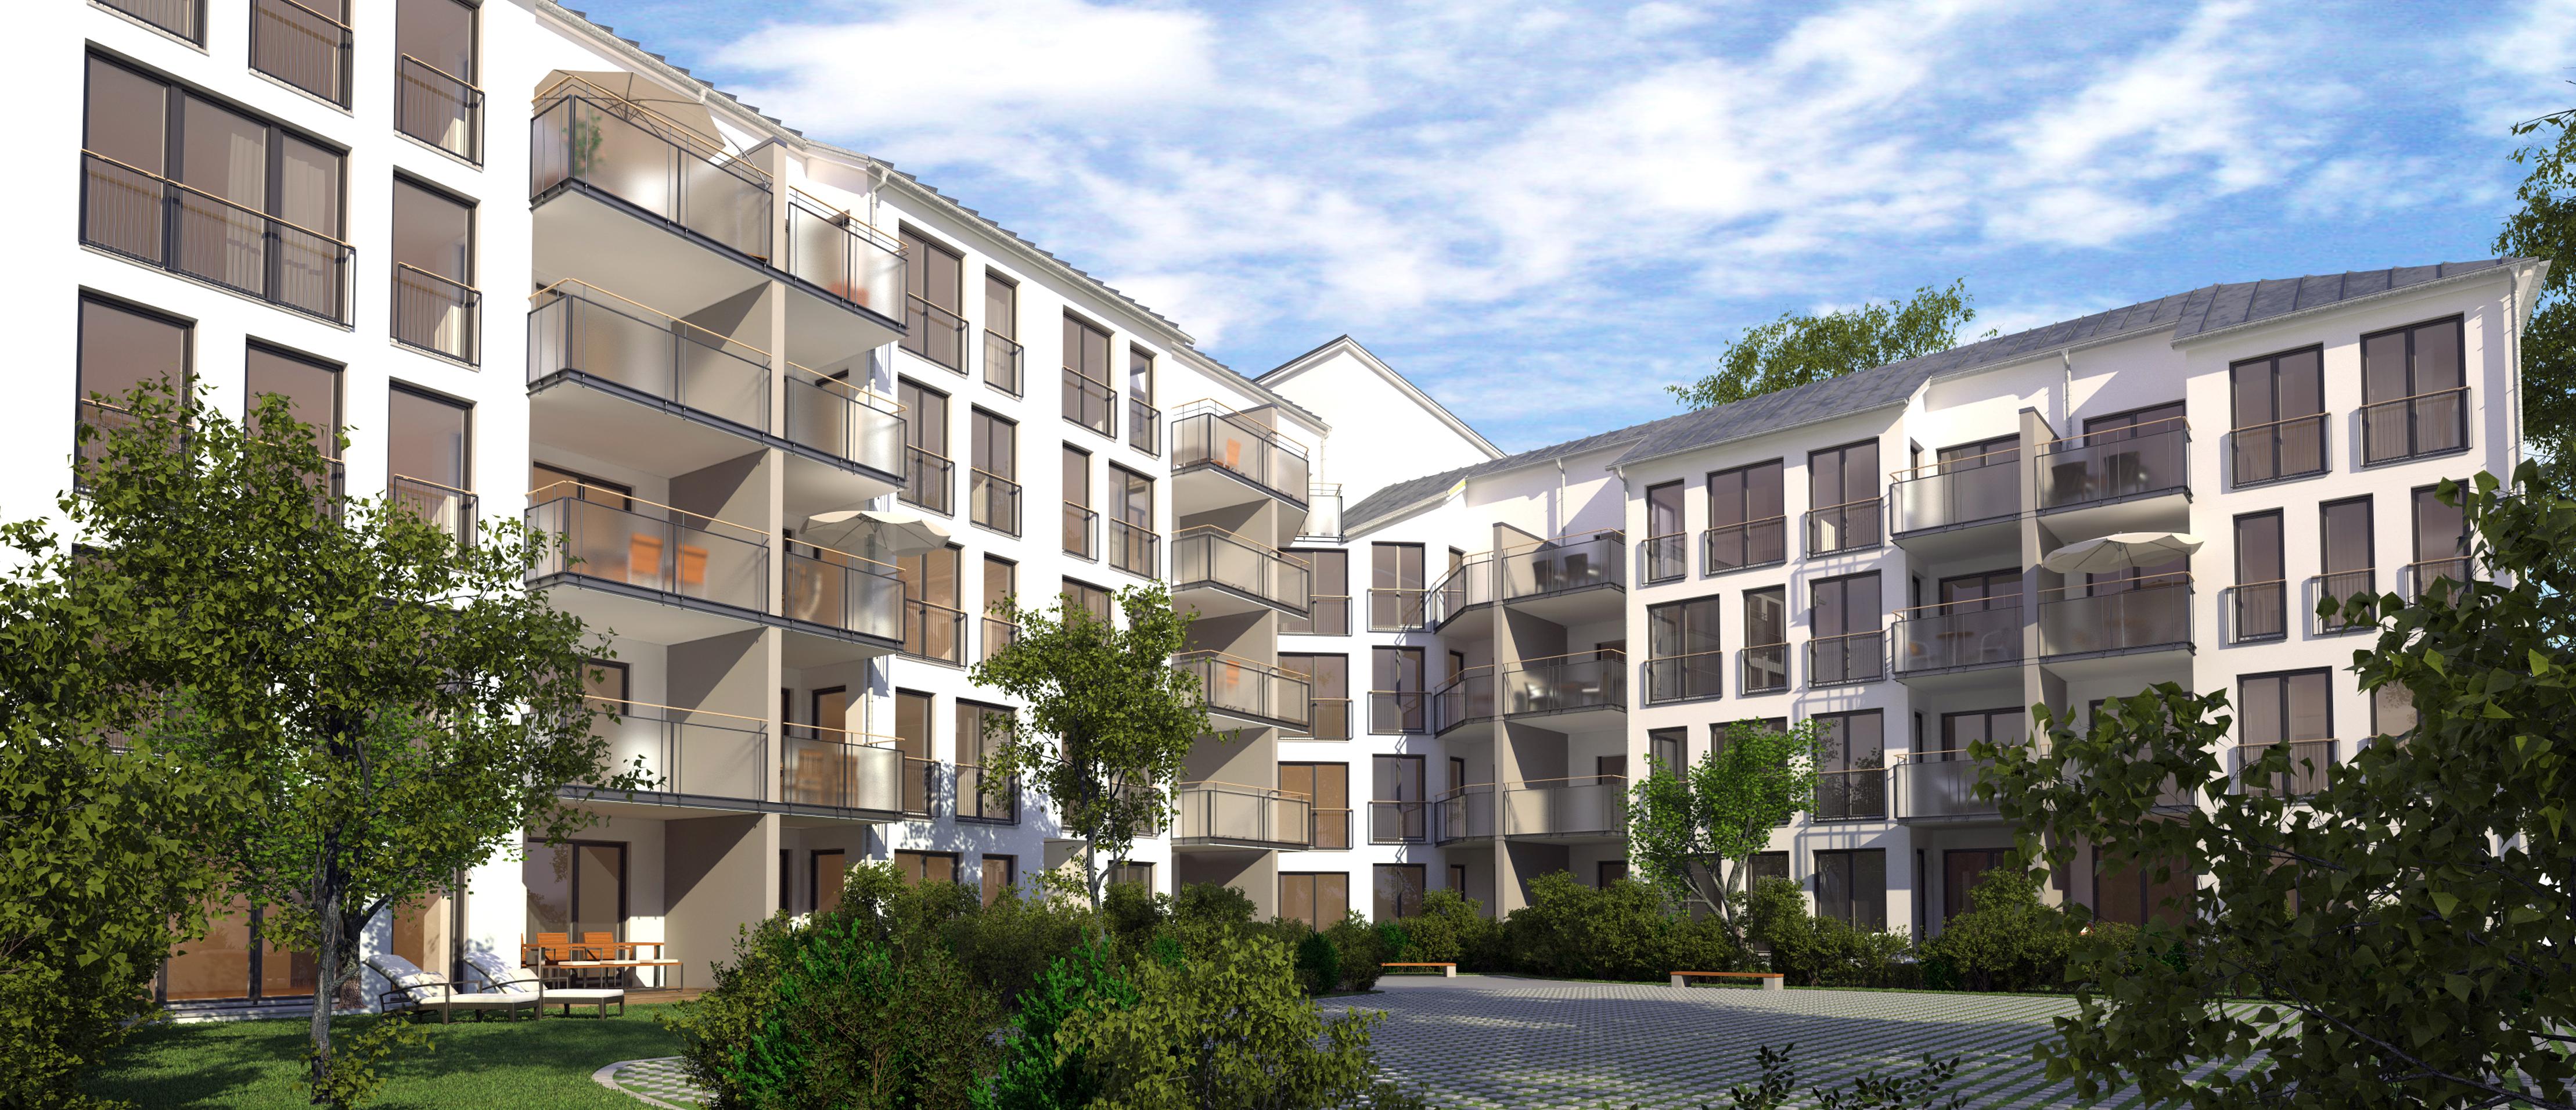 3D-immobilie-ingolstadt-03